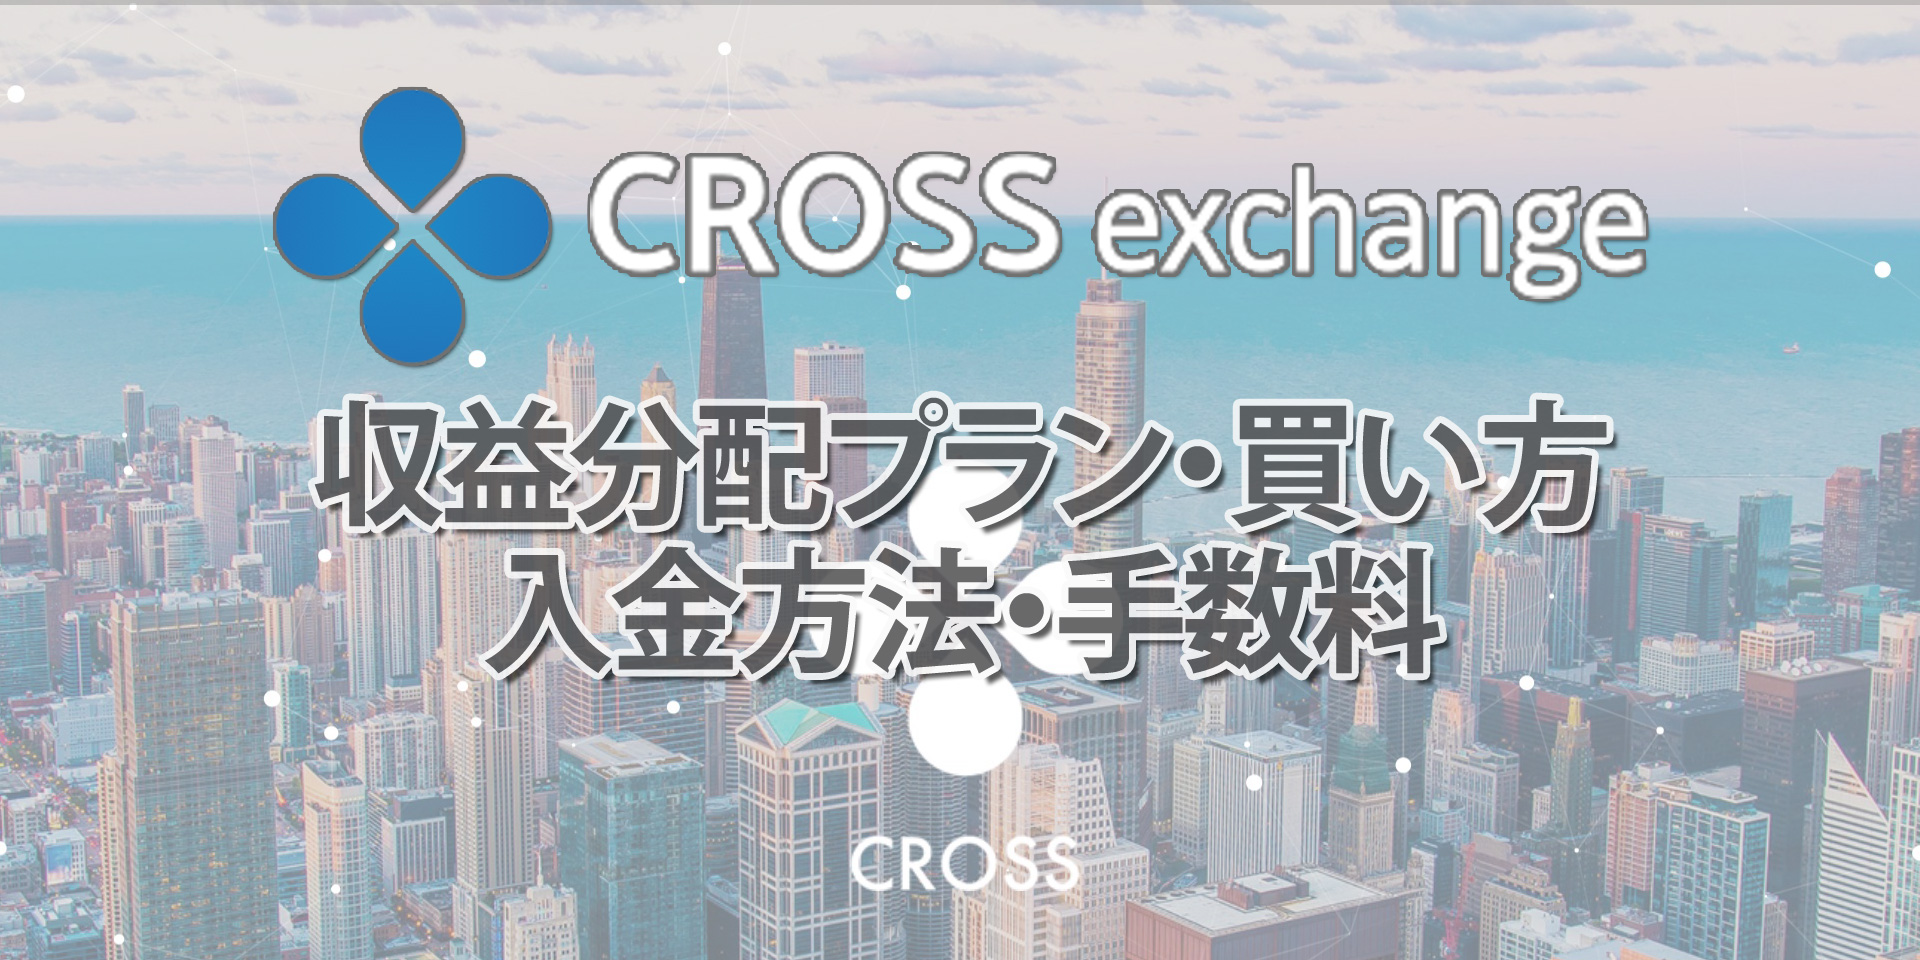 CROSS Exchange(クロスエクスチェンジ)の収益分配プラン、買い方、入金方法、手数料について徹底解説!